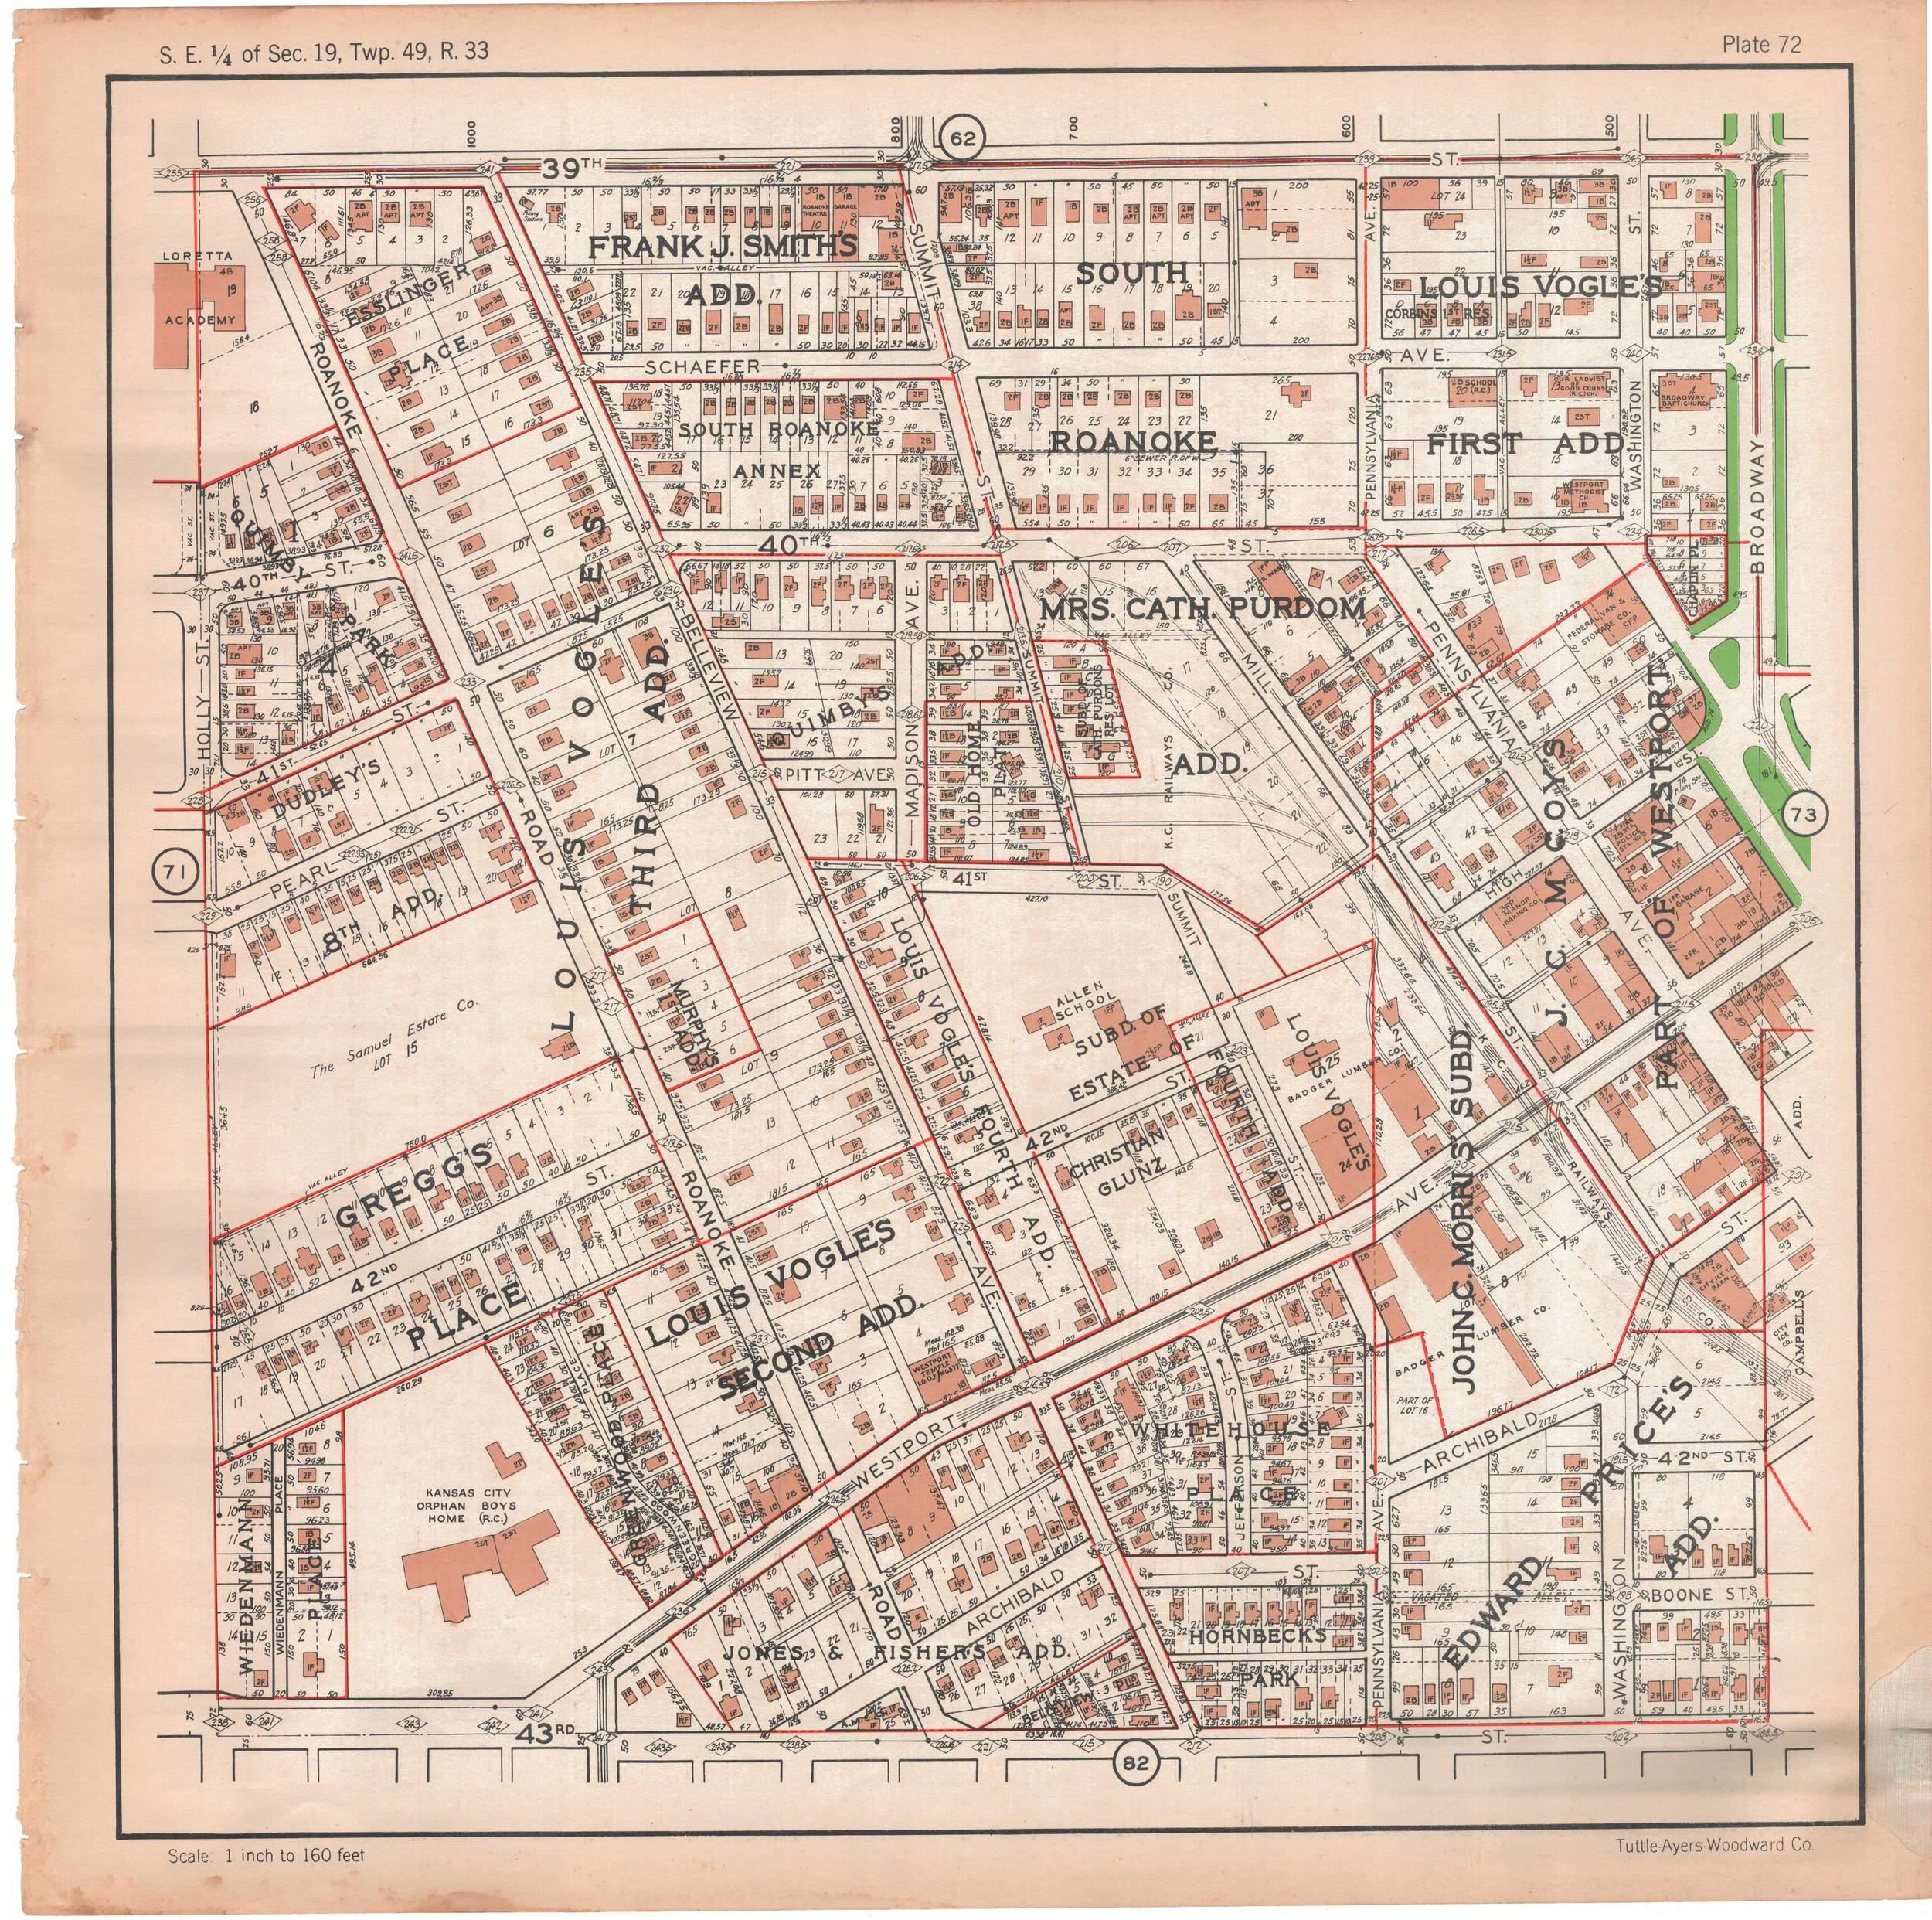 1925 TUTTLE_AYERS_Plate 72.JPG